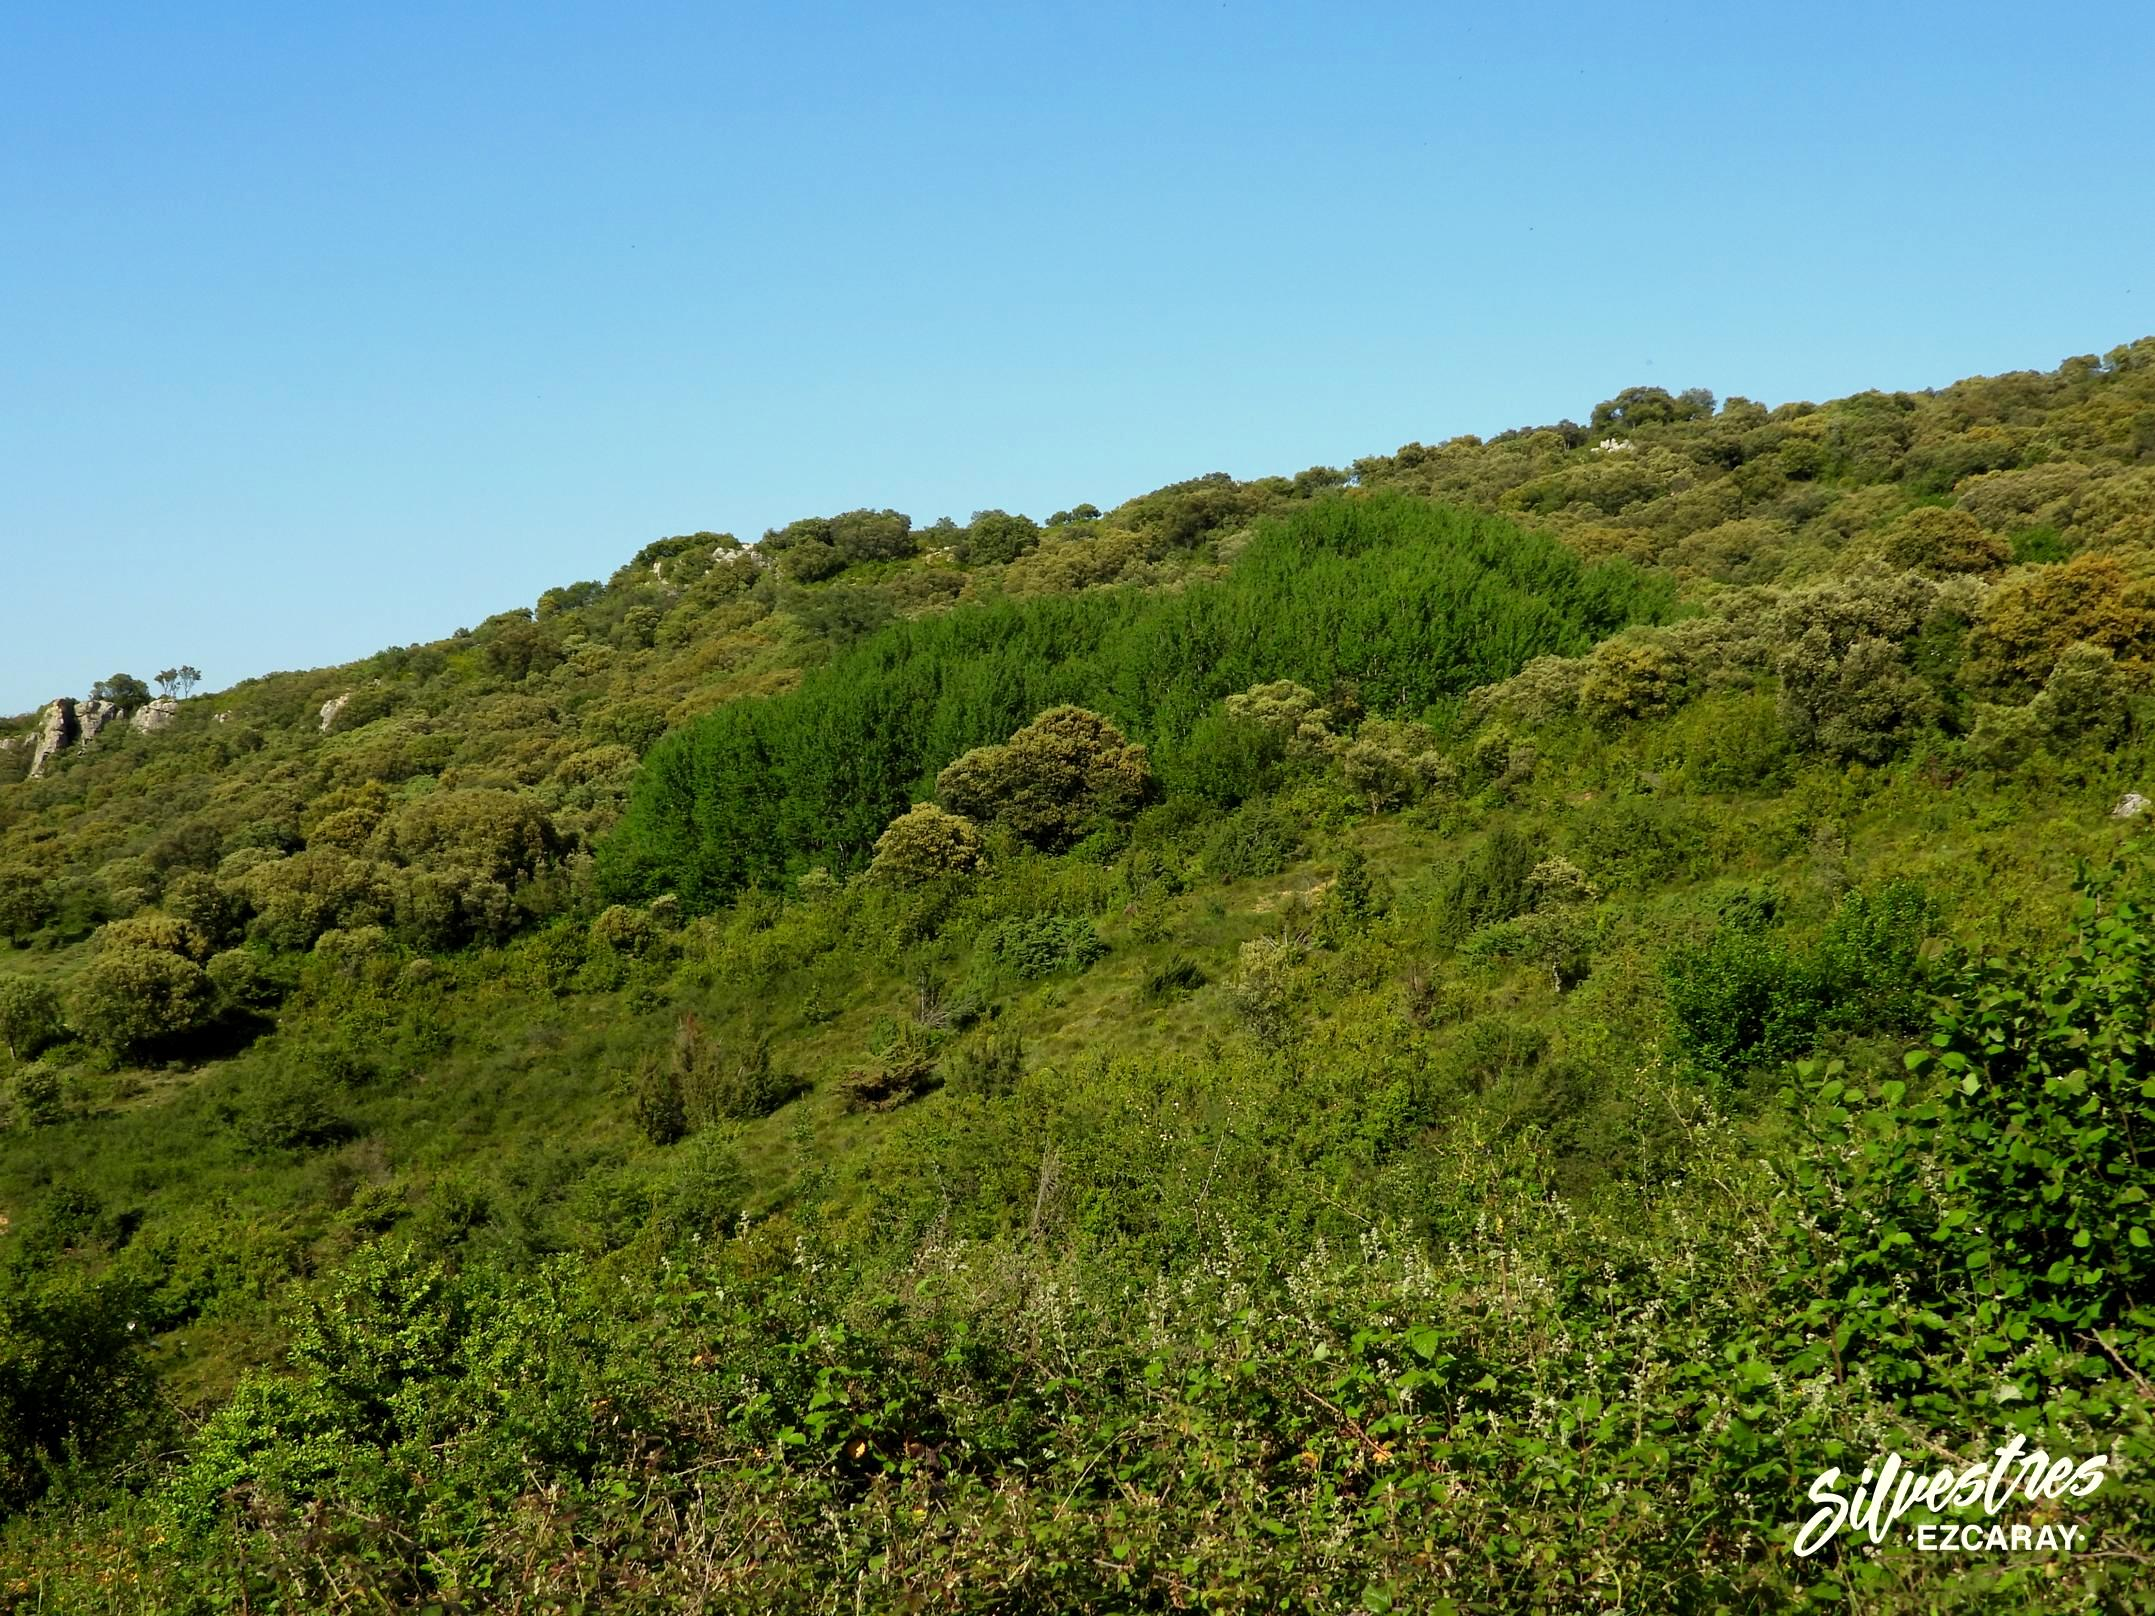 alamo_temblon_la_rioja_montes_obarenes_rutas_botánicas_paisajes_silvestres_ezcaray